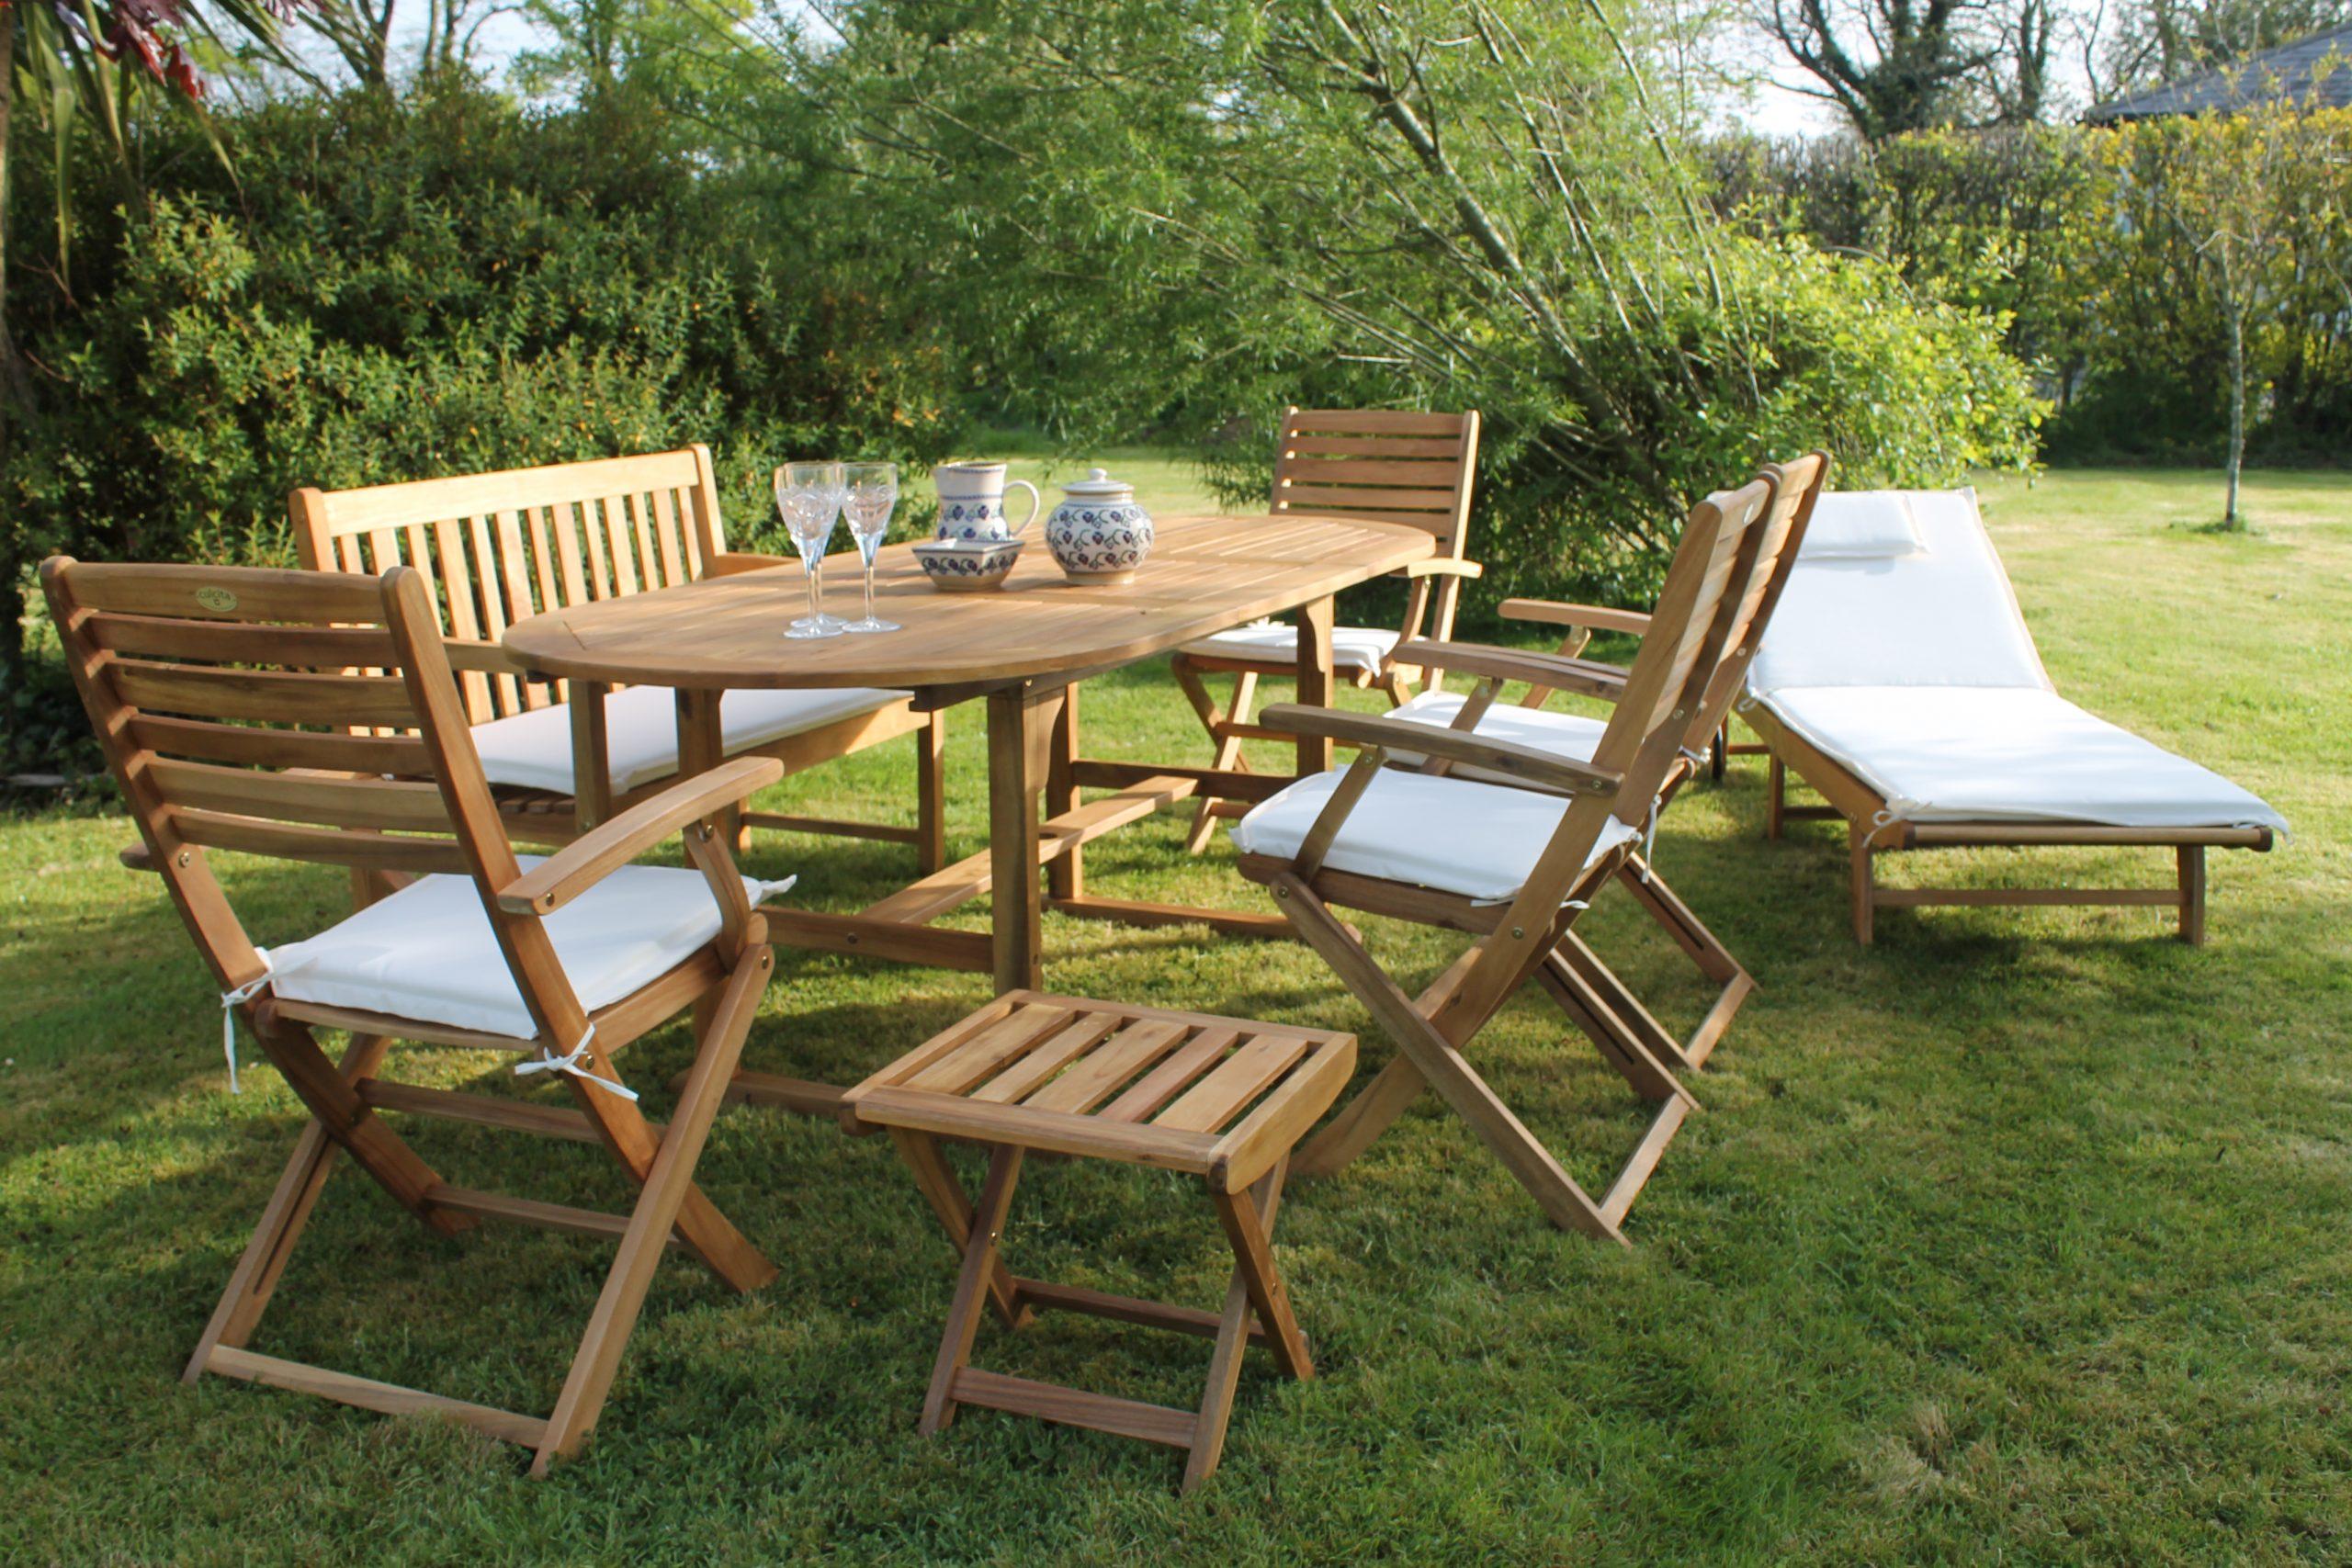 Tara 14 Piece Eco Dining Set garden furniture Ireland